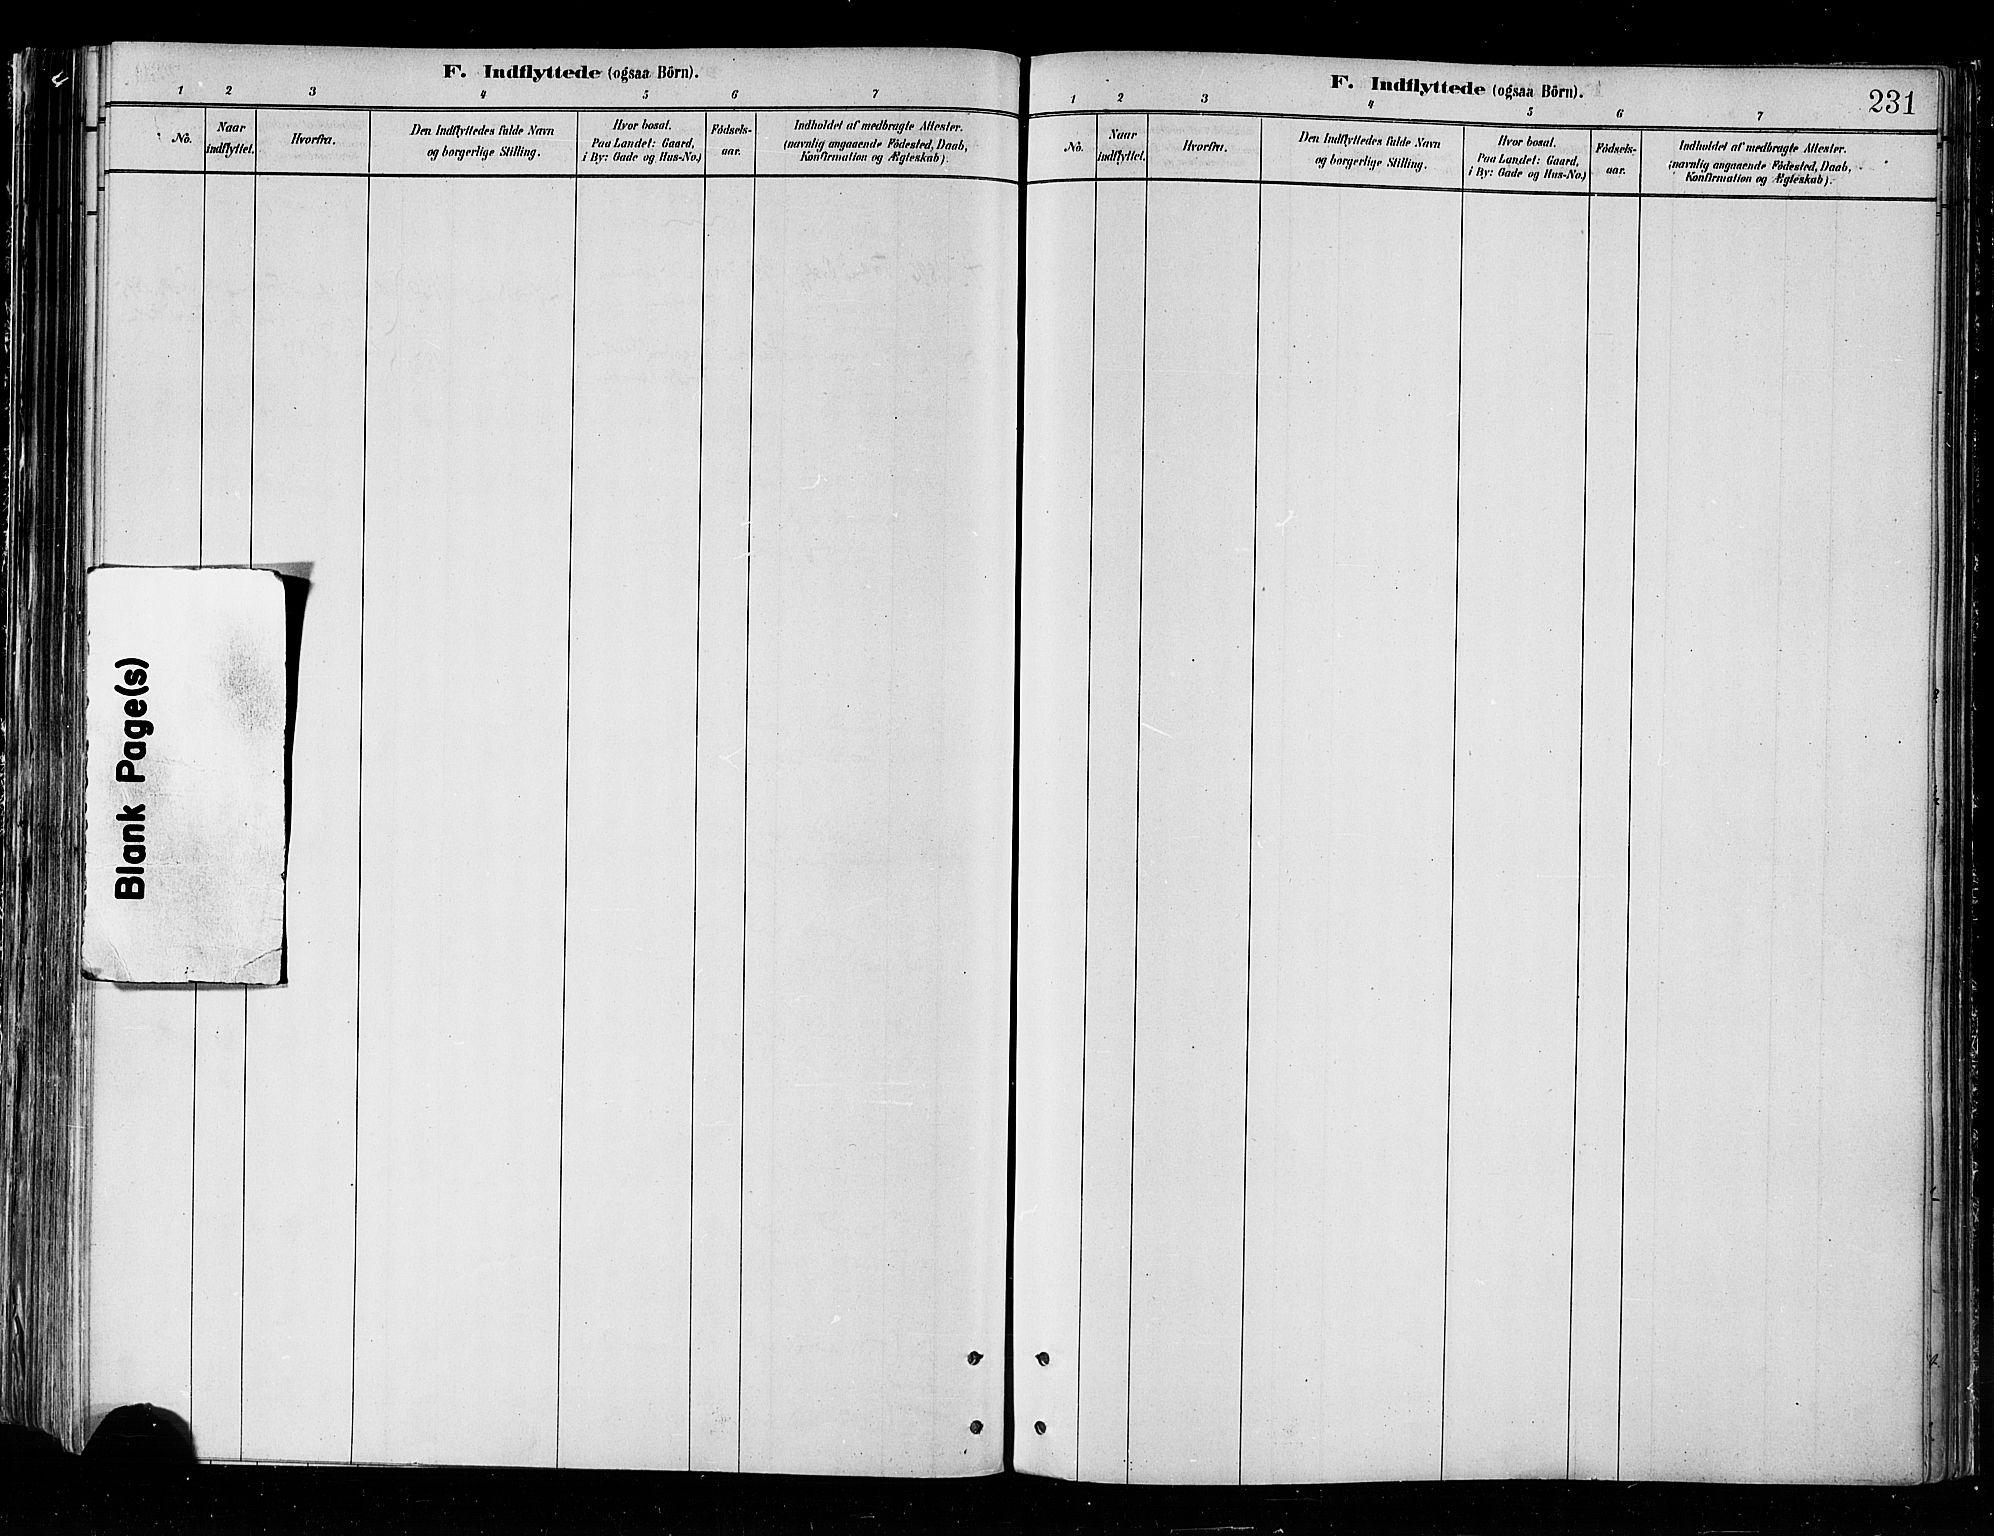 SATØ, Skjervøy sokneprestkontor, H/Ha/Haa/L0010kirke: Ministerialbok nr. 10, 1887-1898, s. 231